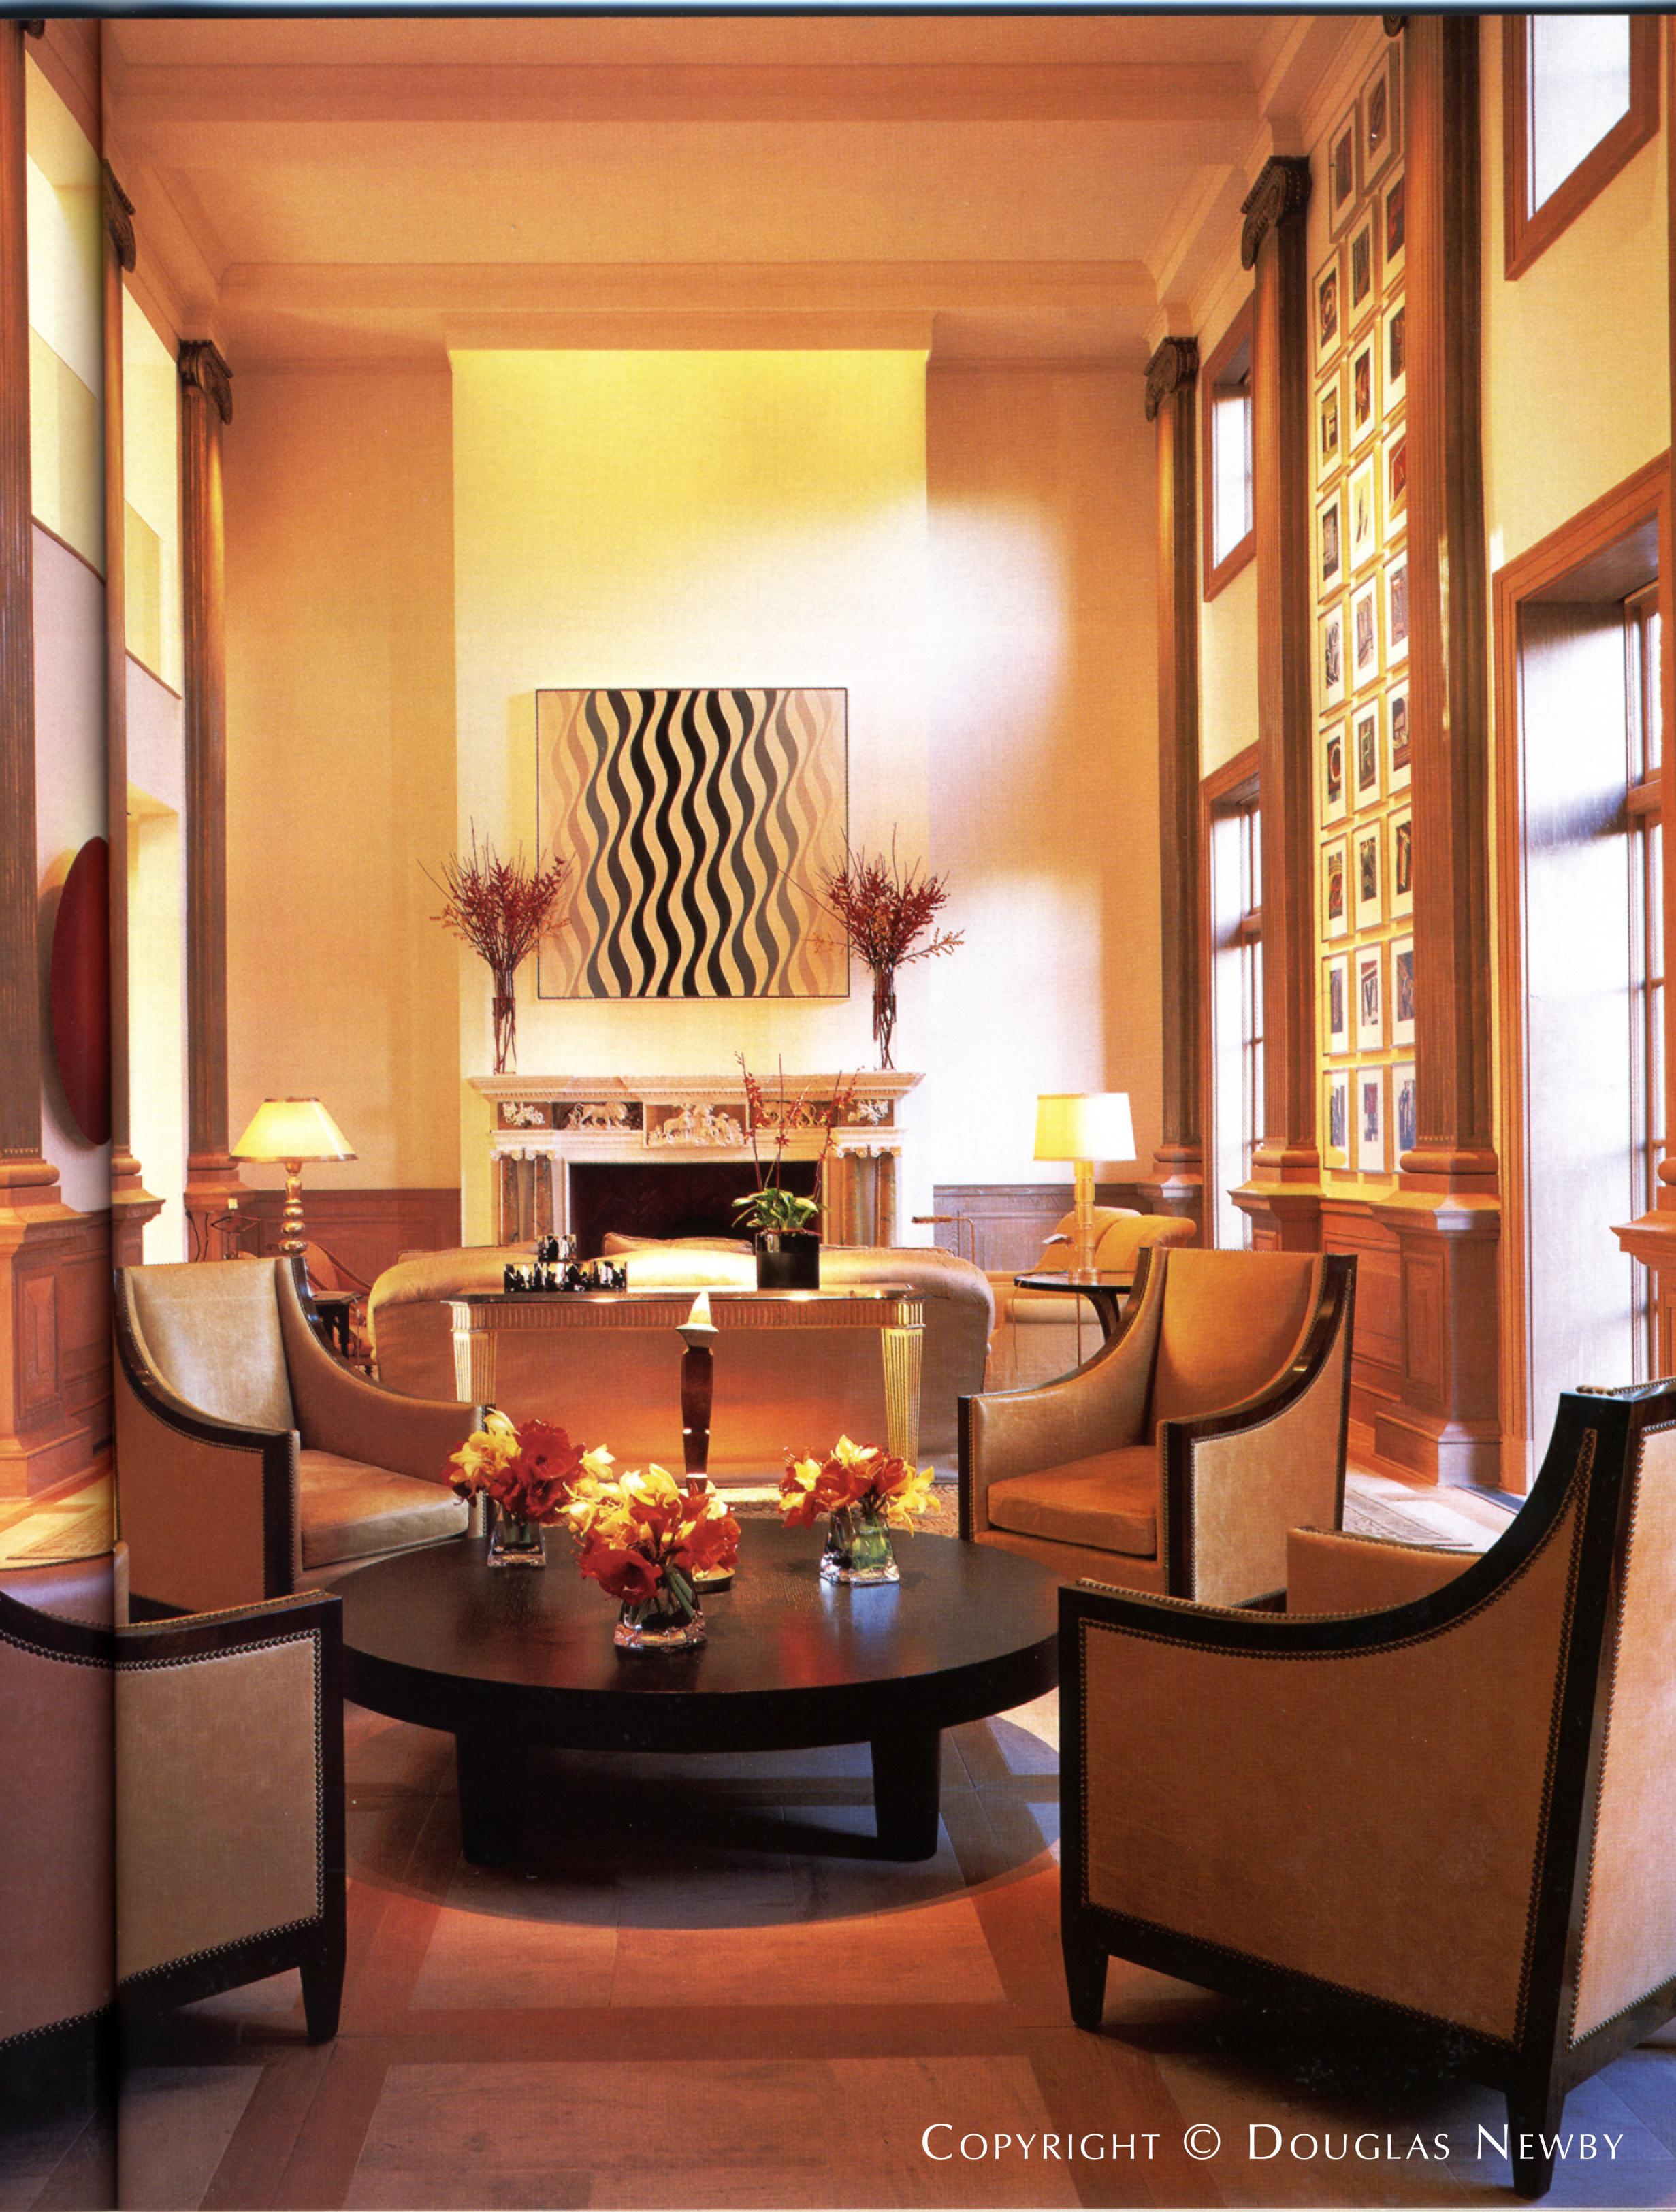 Interior Designed by Paul Draper in Architect James Langford Designed Home